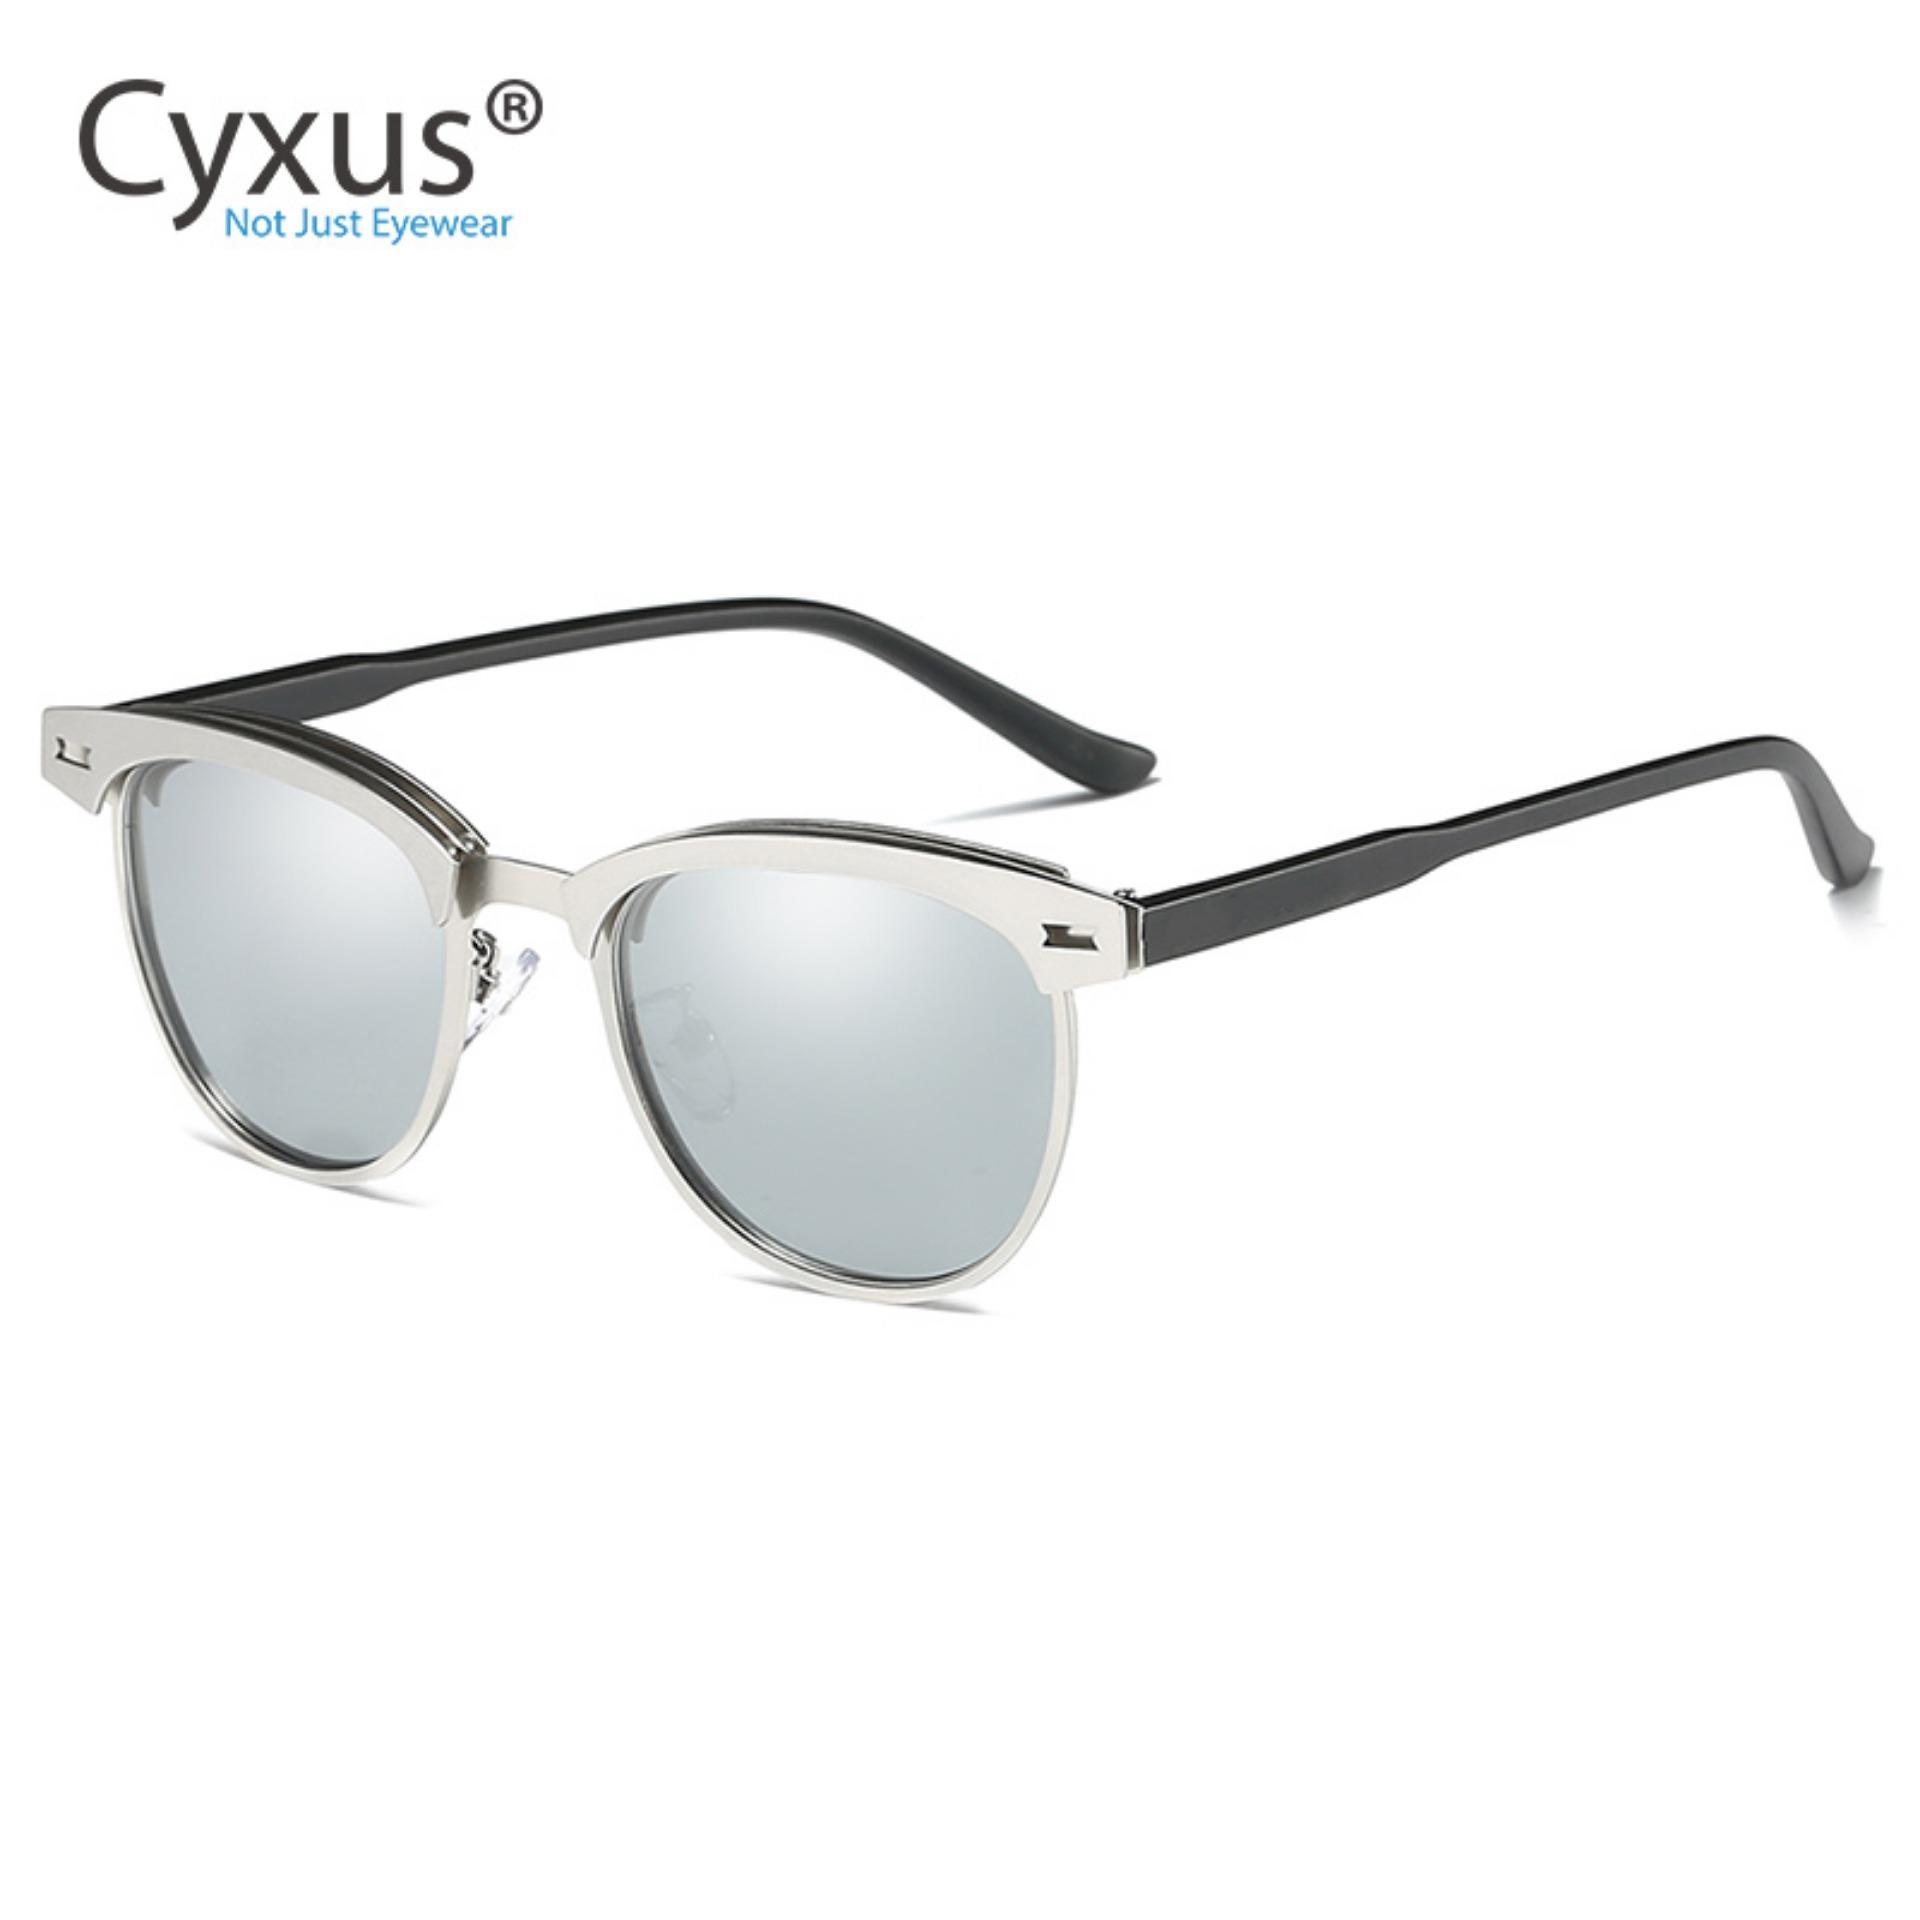 772b77712f52 Cyxus Fashion Polarized Sunglasses women men Half-Rim Retro Sun Glasses